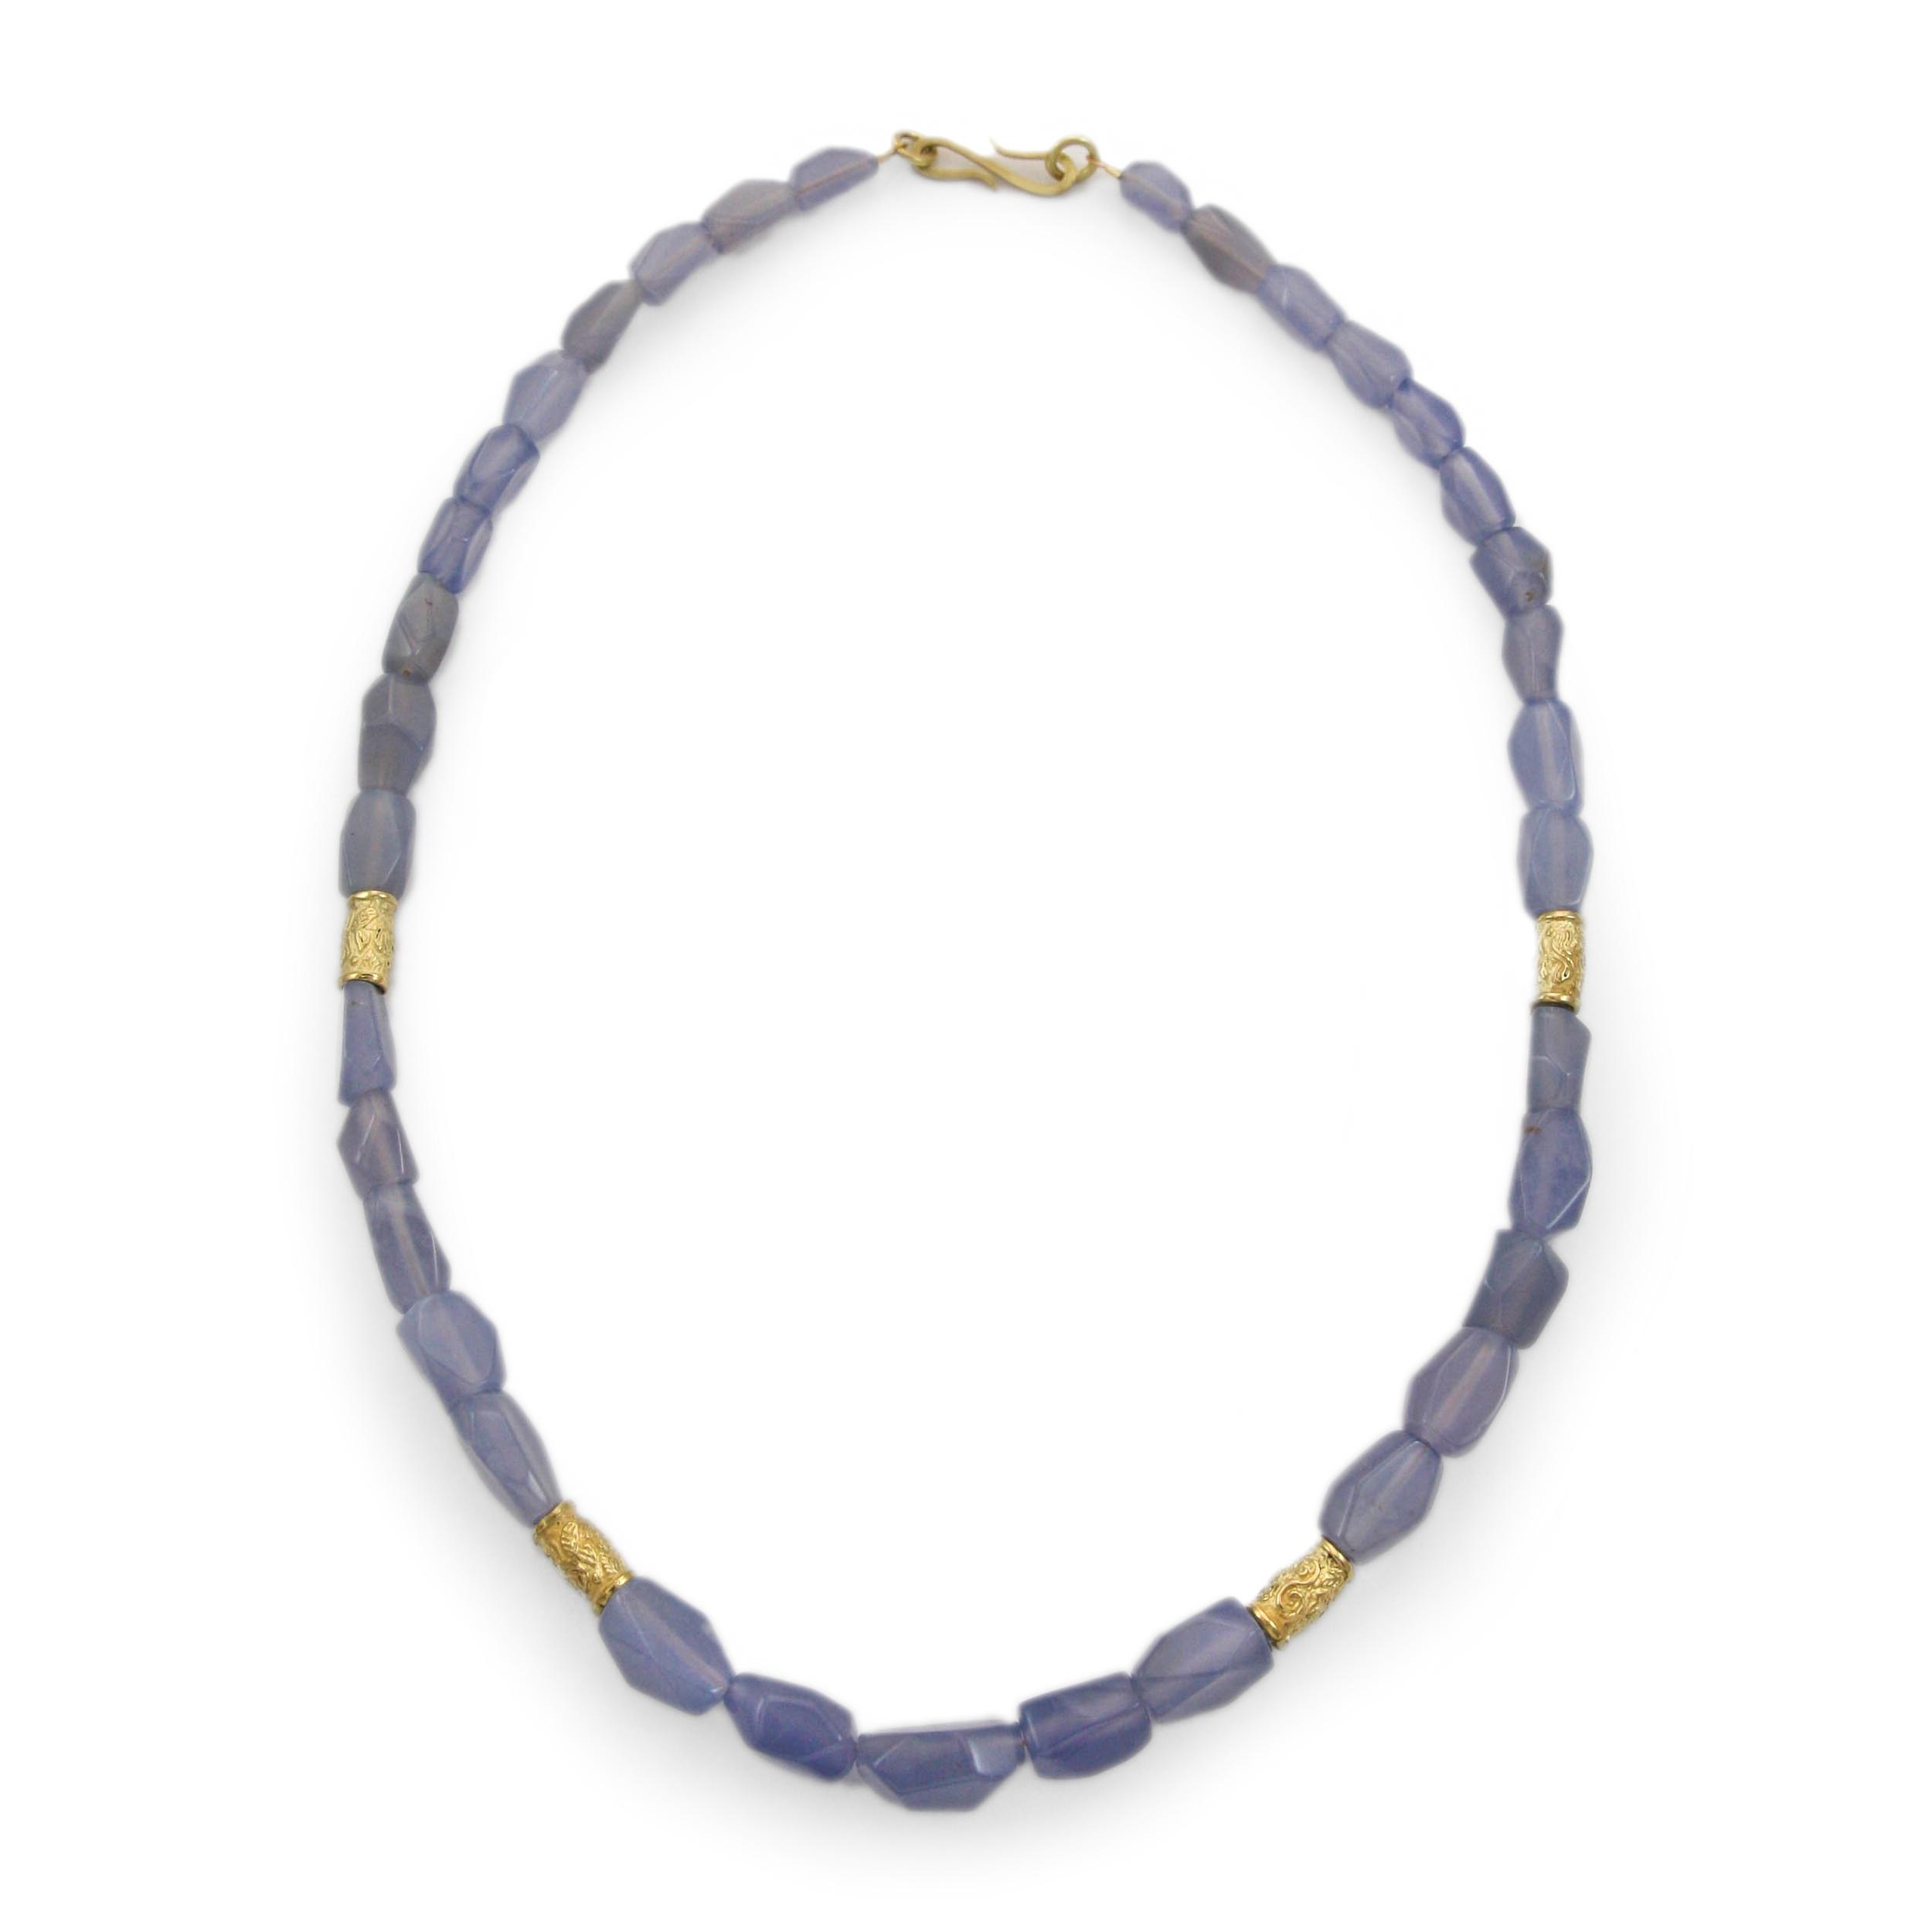 PATTERN chalcedony necklace w beads (1 of 1).jpg